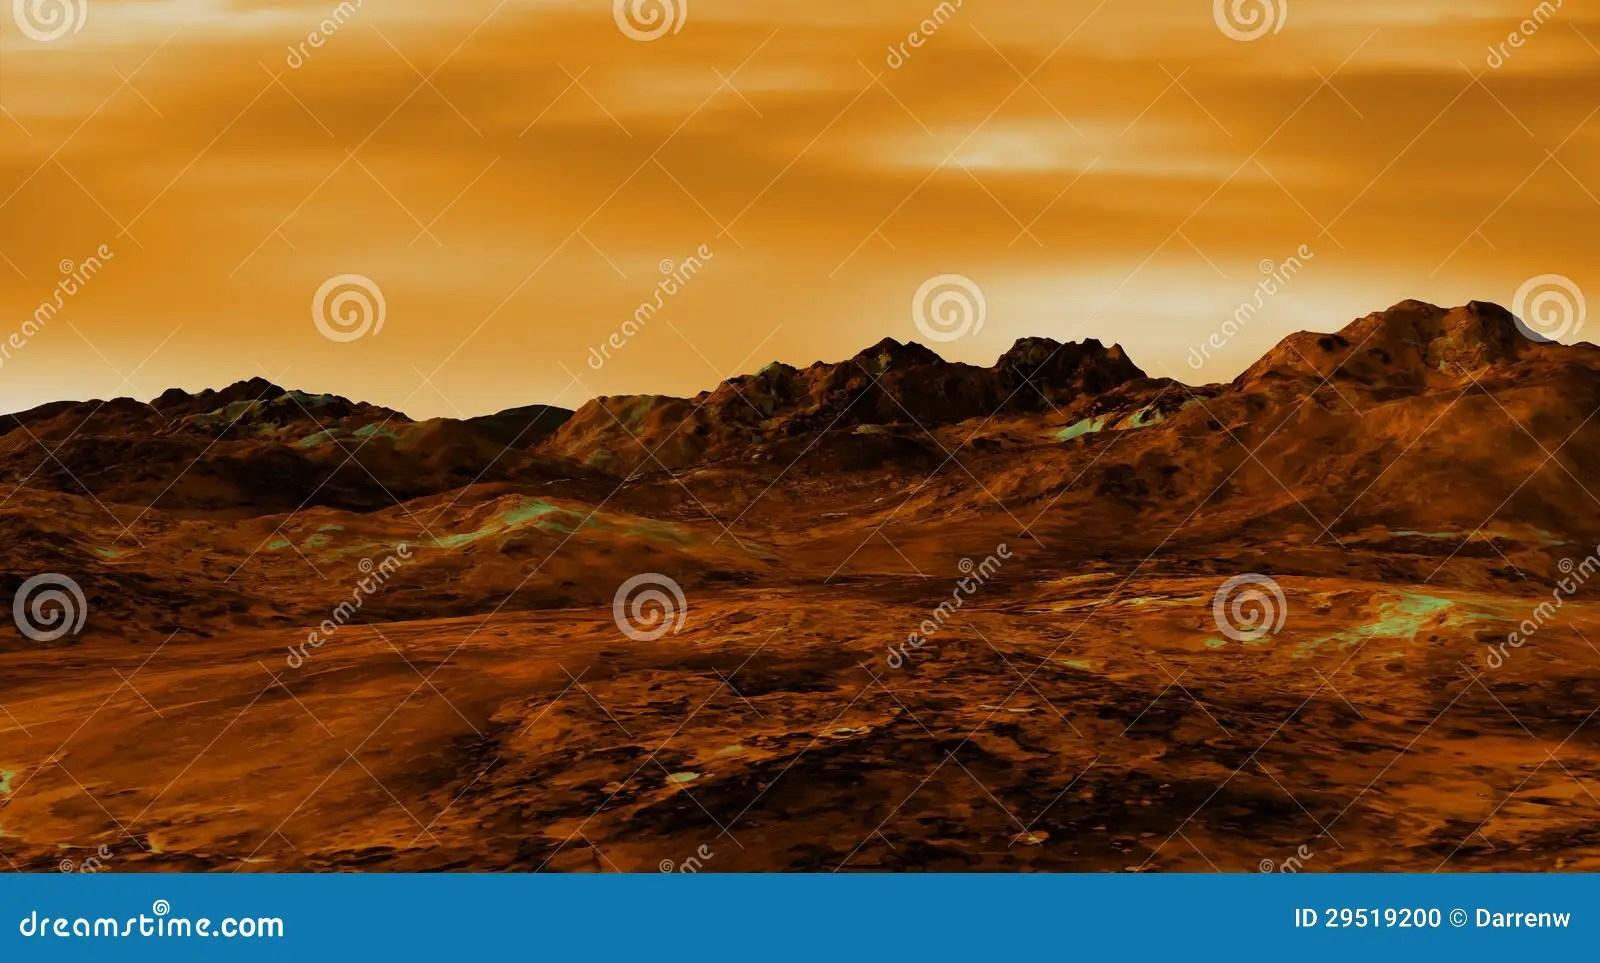 Venus Landscape Stock Photo  Image 29519200